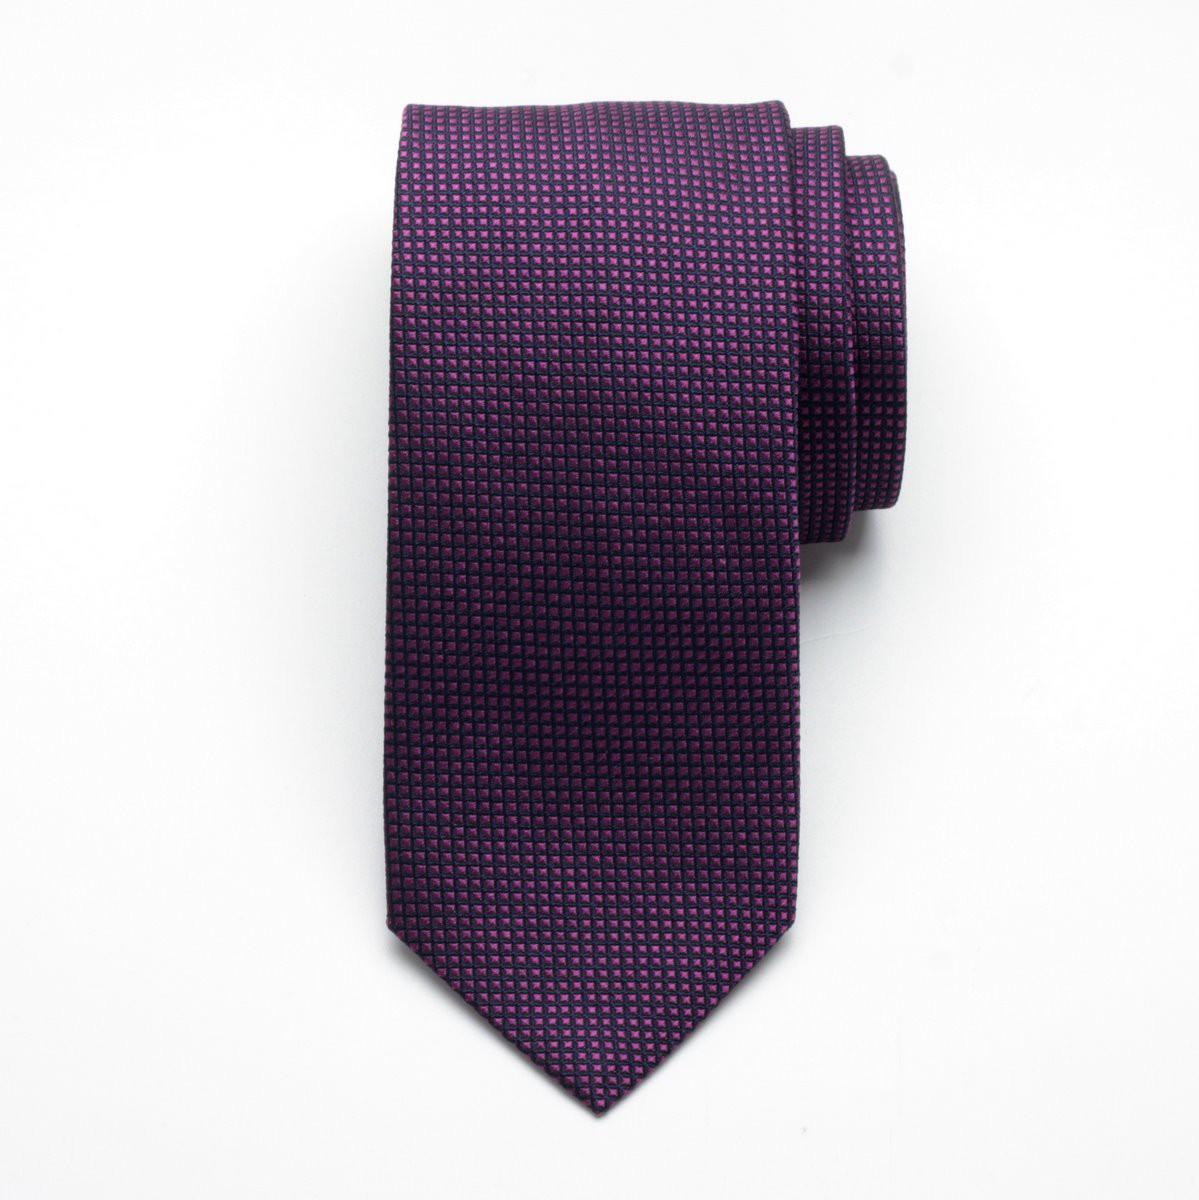 Krawat jedwabny Fine Selection (wzór 83)